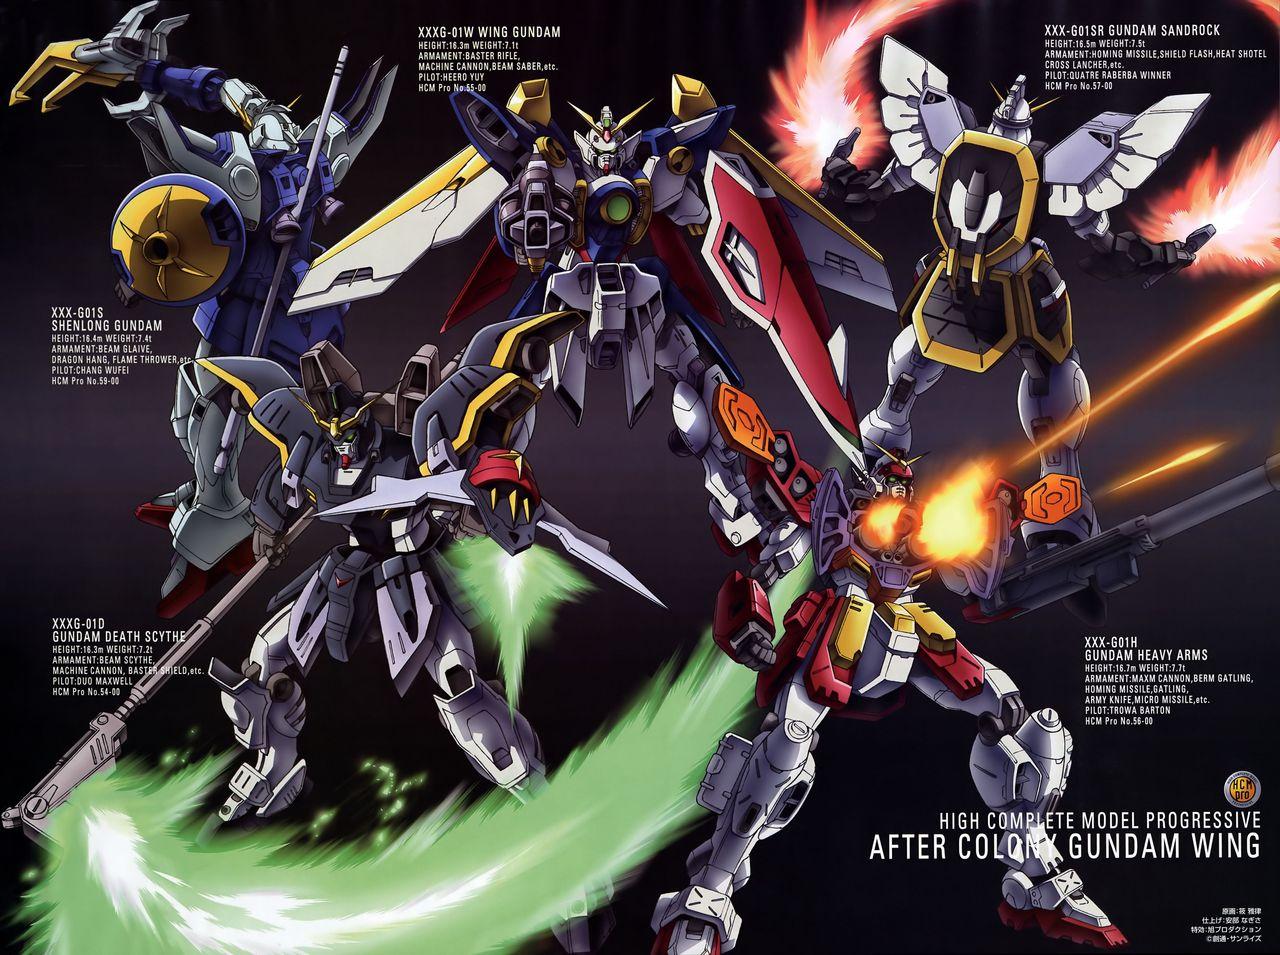 49] Gundam Wing Deathscythe Wallpaper on WallpaperSafari 1280x955